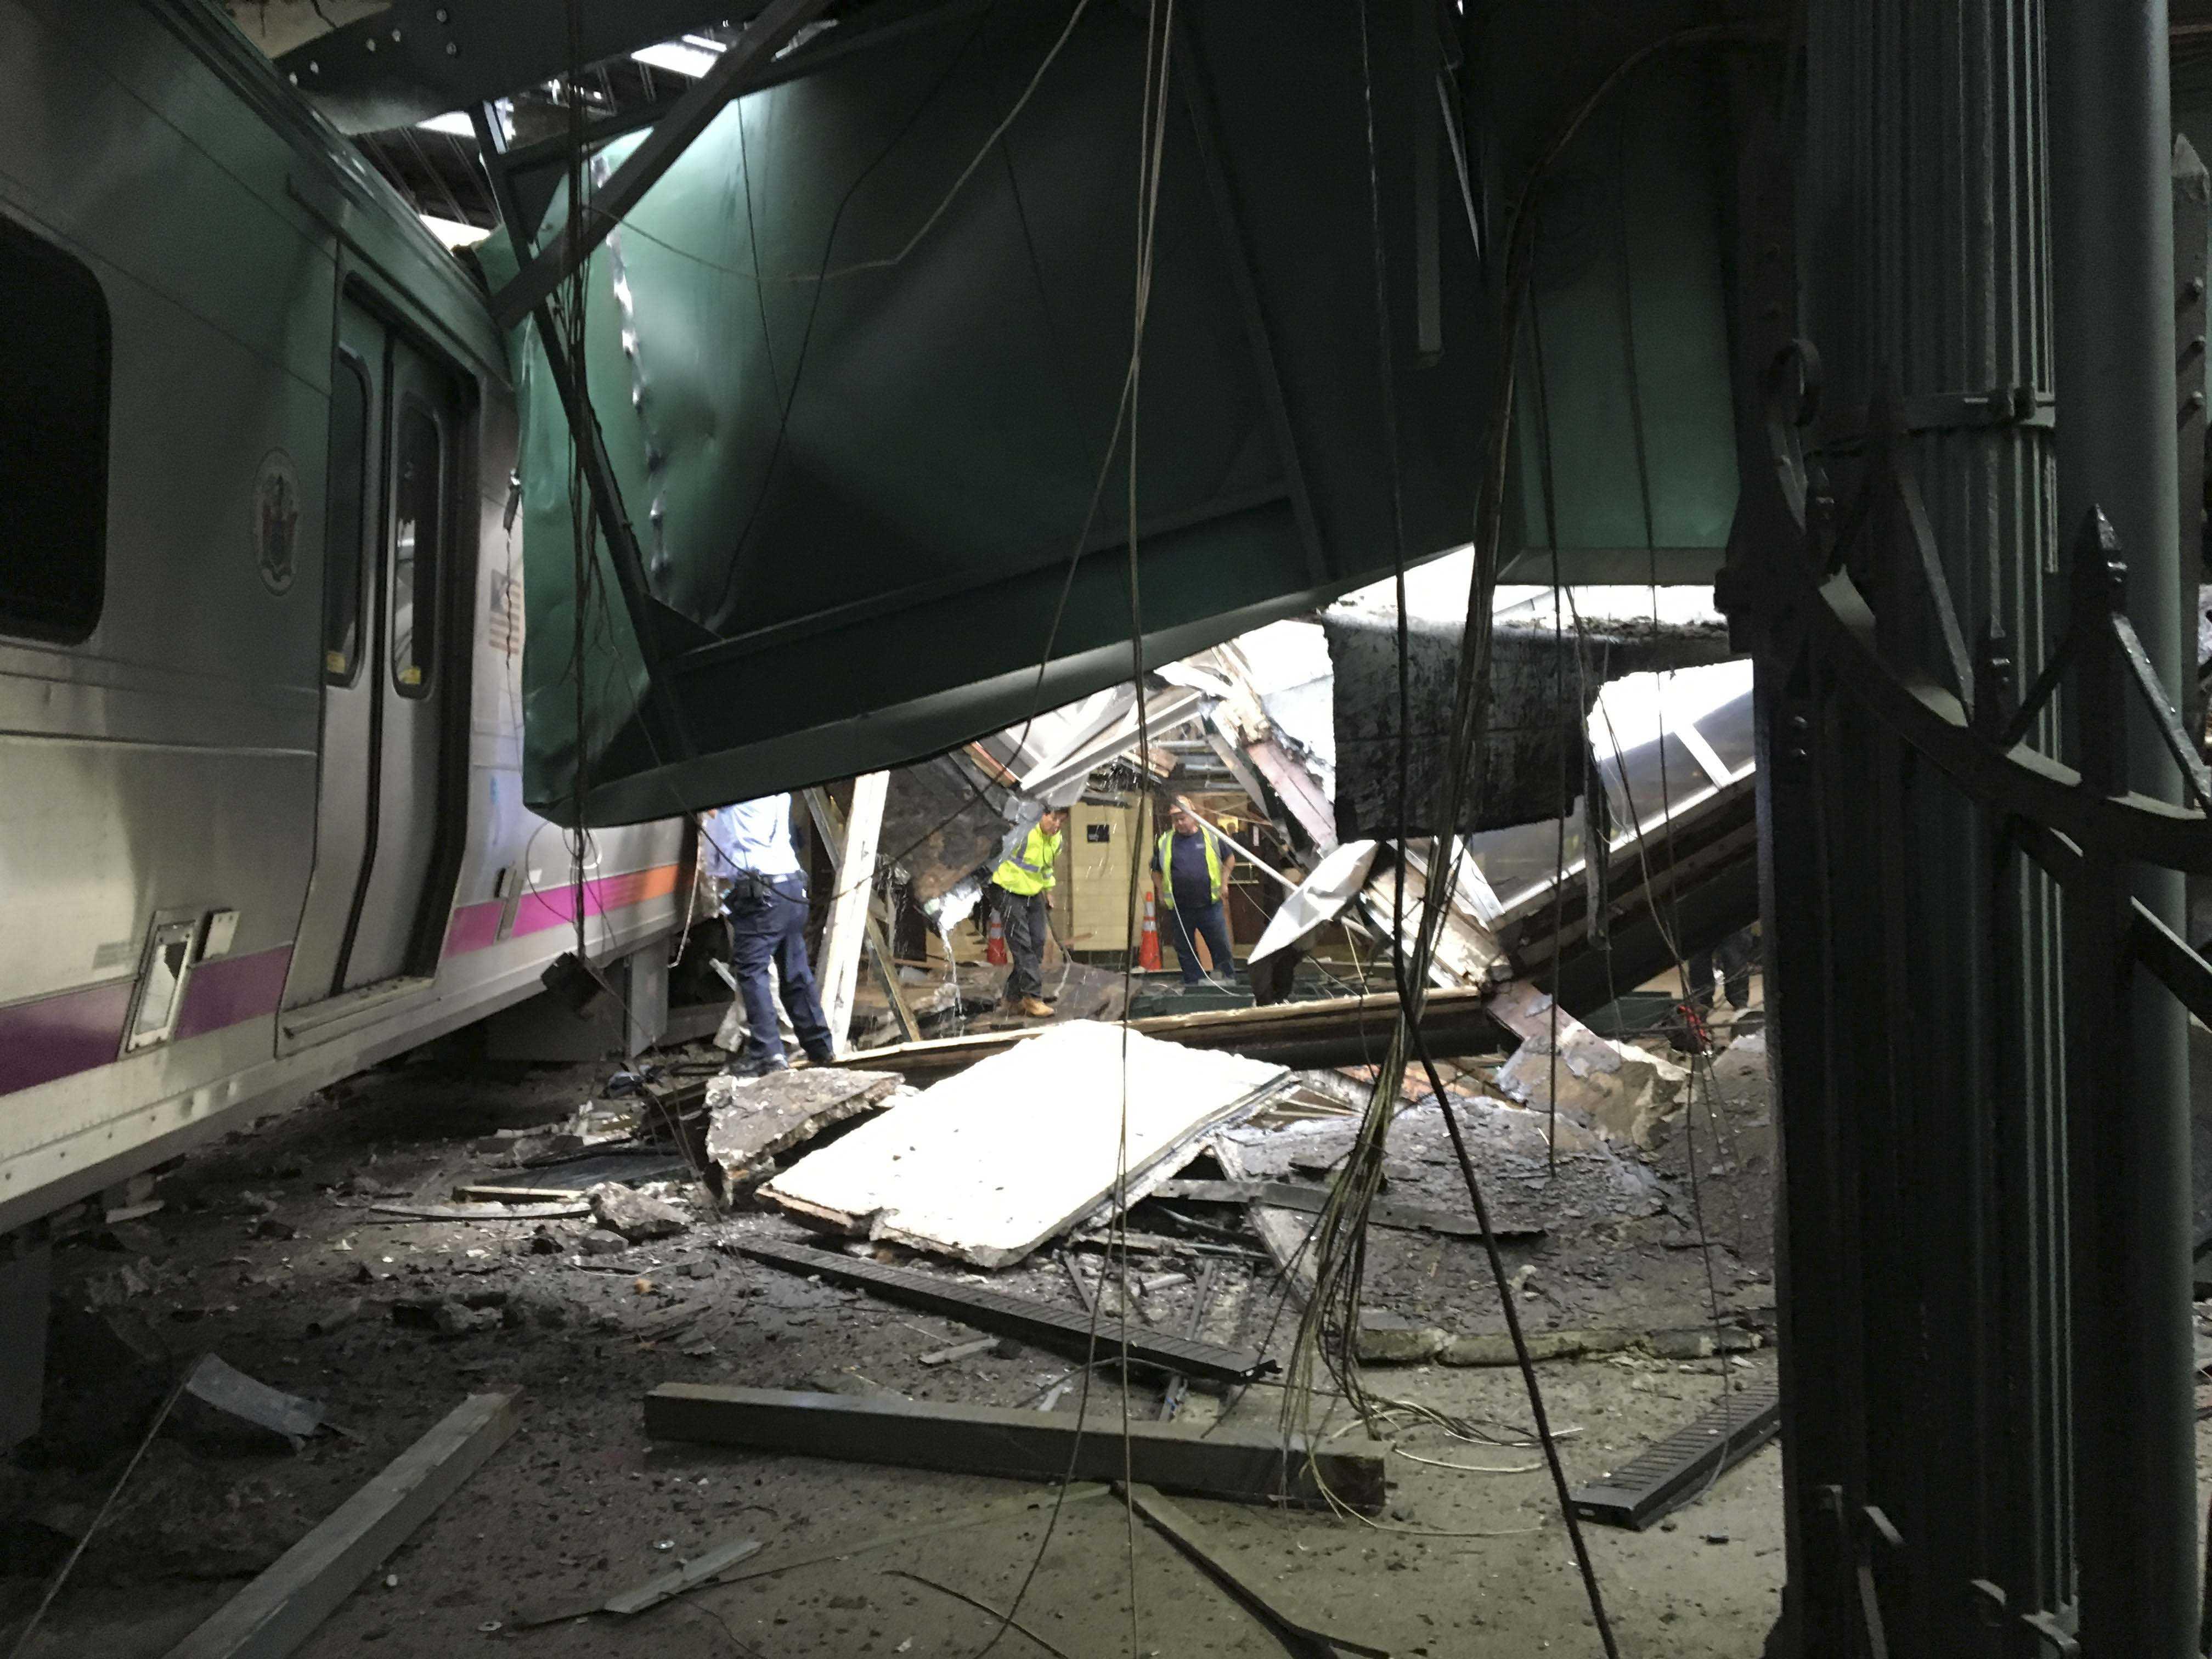 CAS alumna Allie Cai shares her experience of the Hoboken train crash.